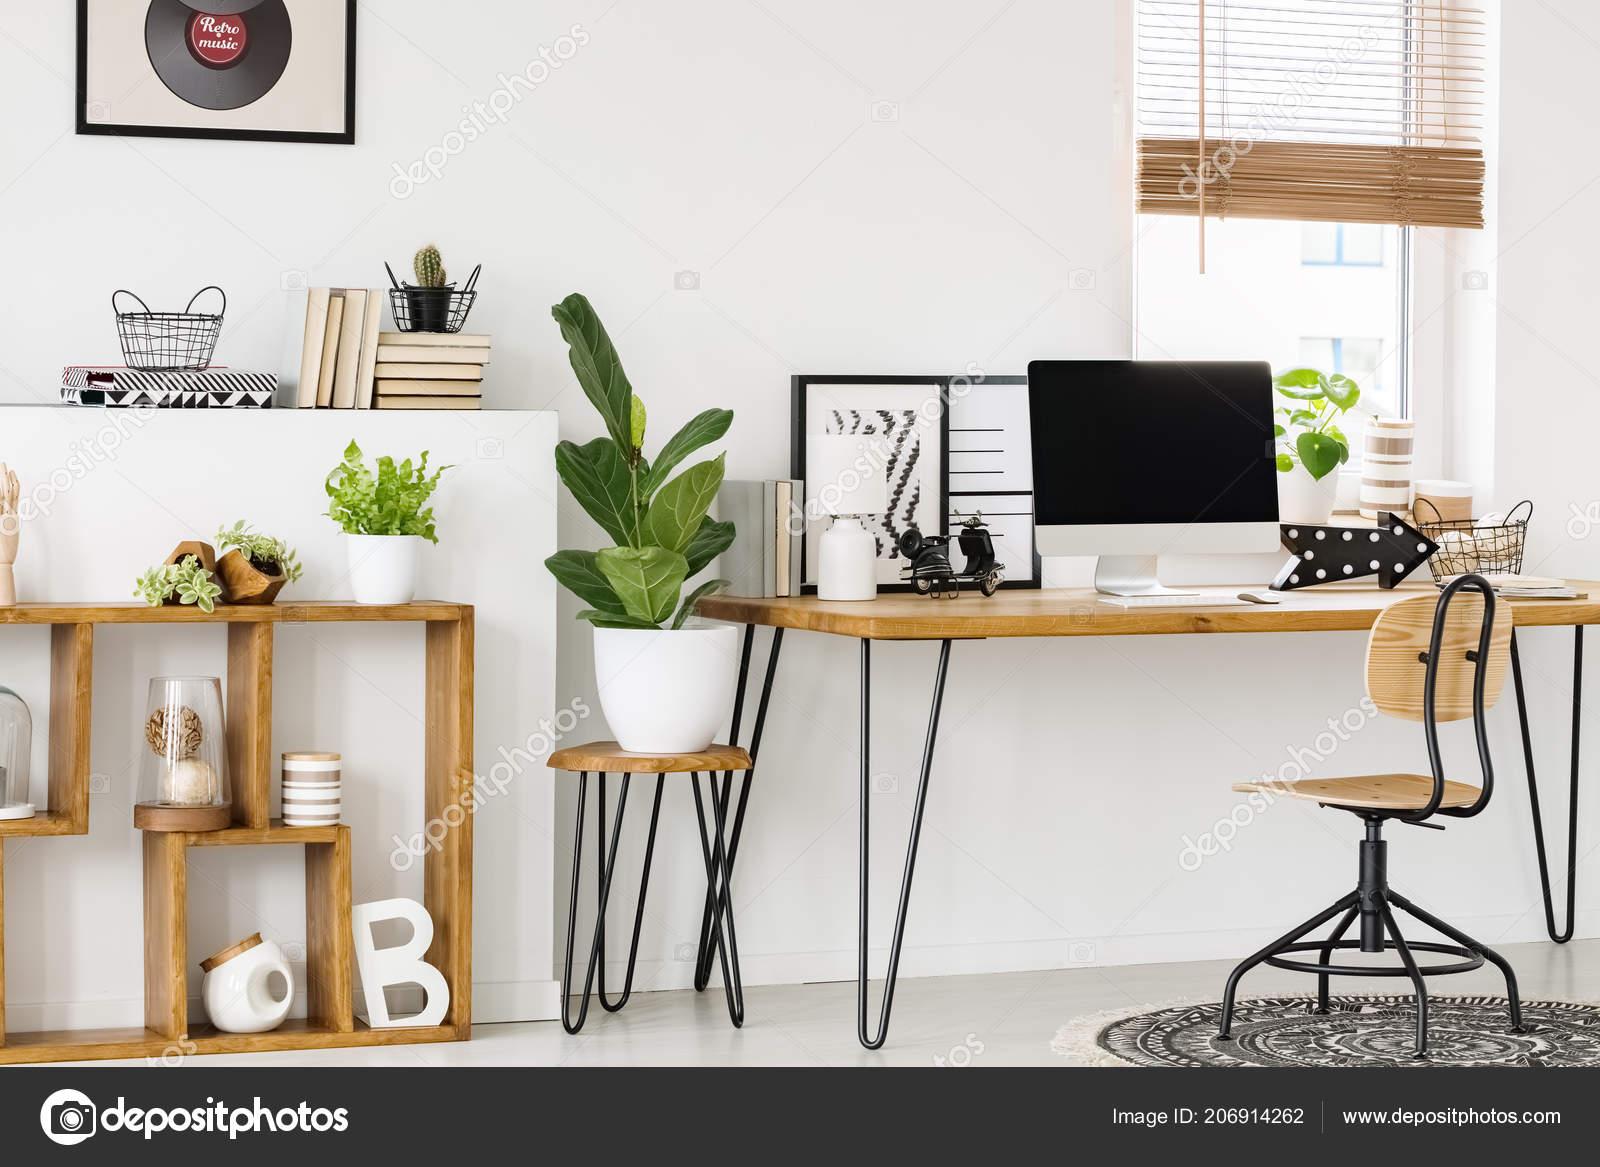 Pianta sgabello accanto alla scrivania legno con computer desktop